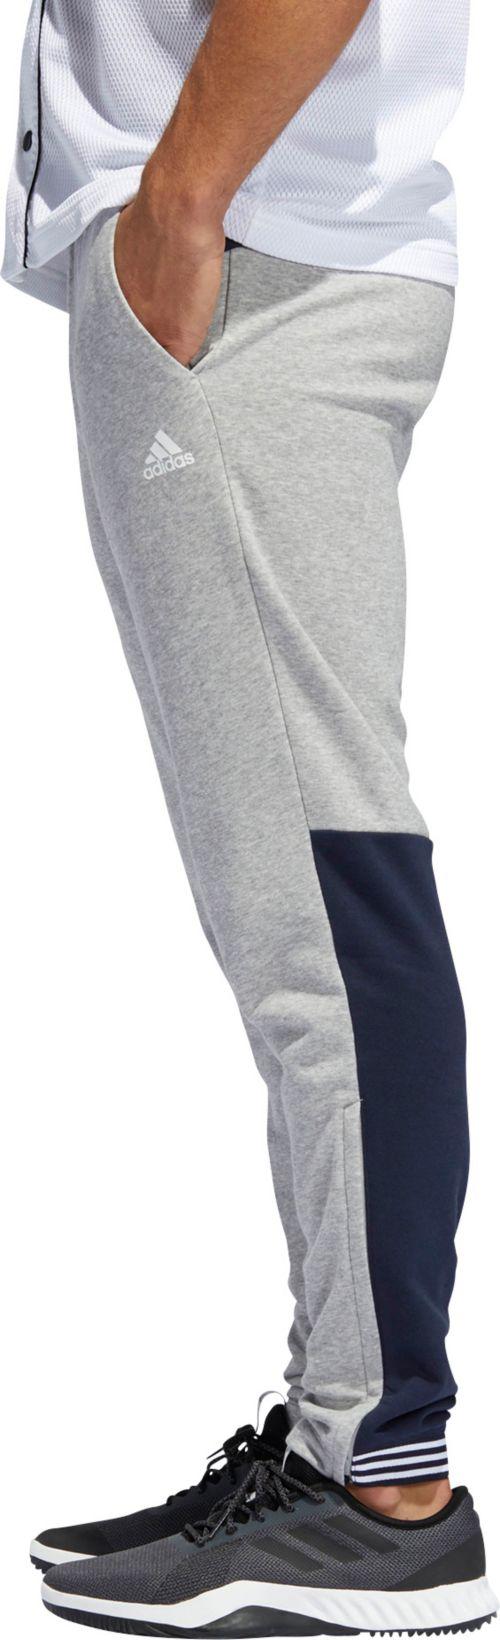 quality design f1f09 68a61 adidas Men s Sport 2 Street Pants